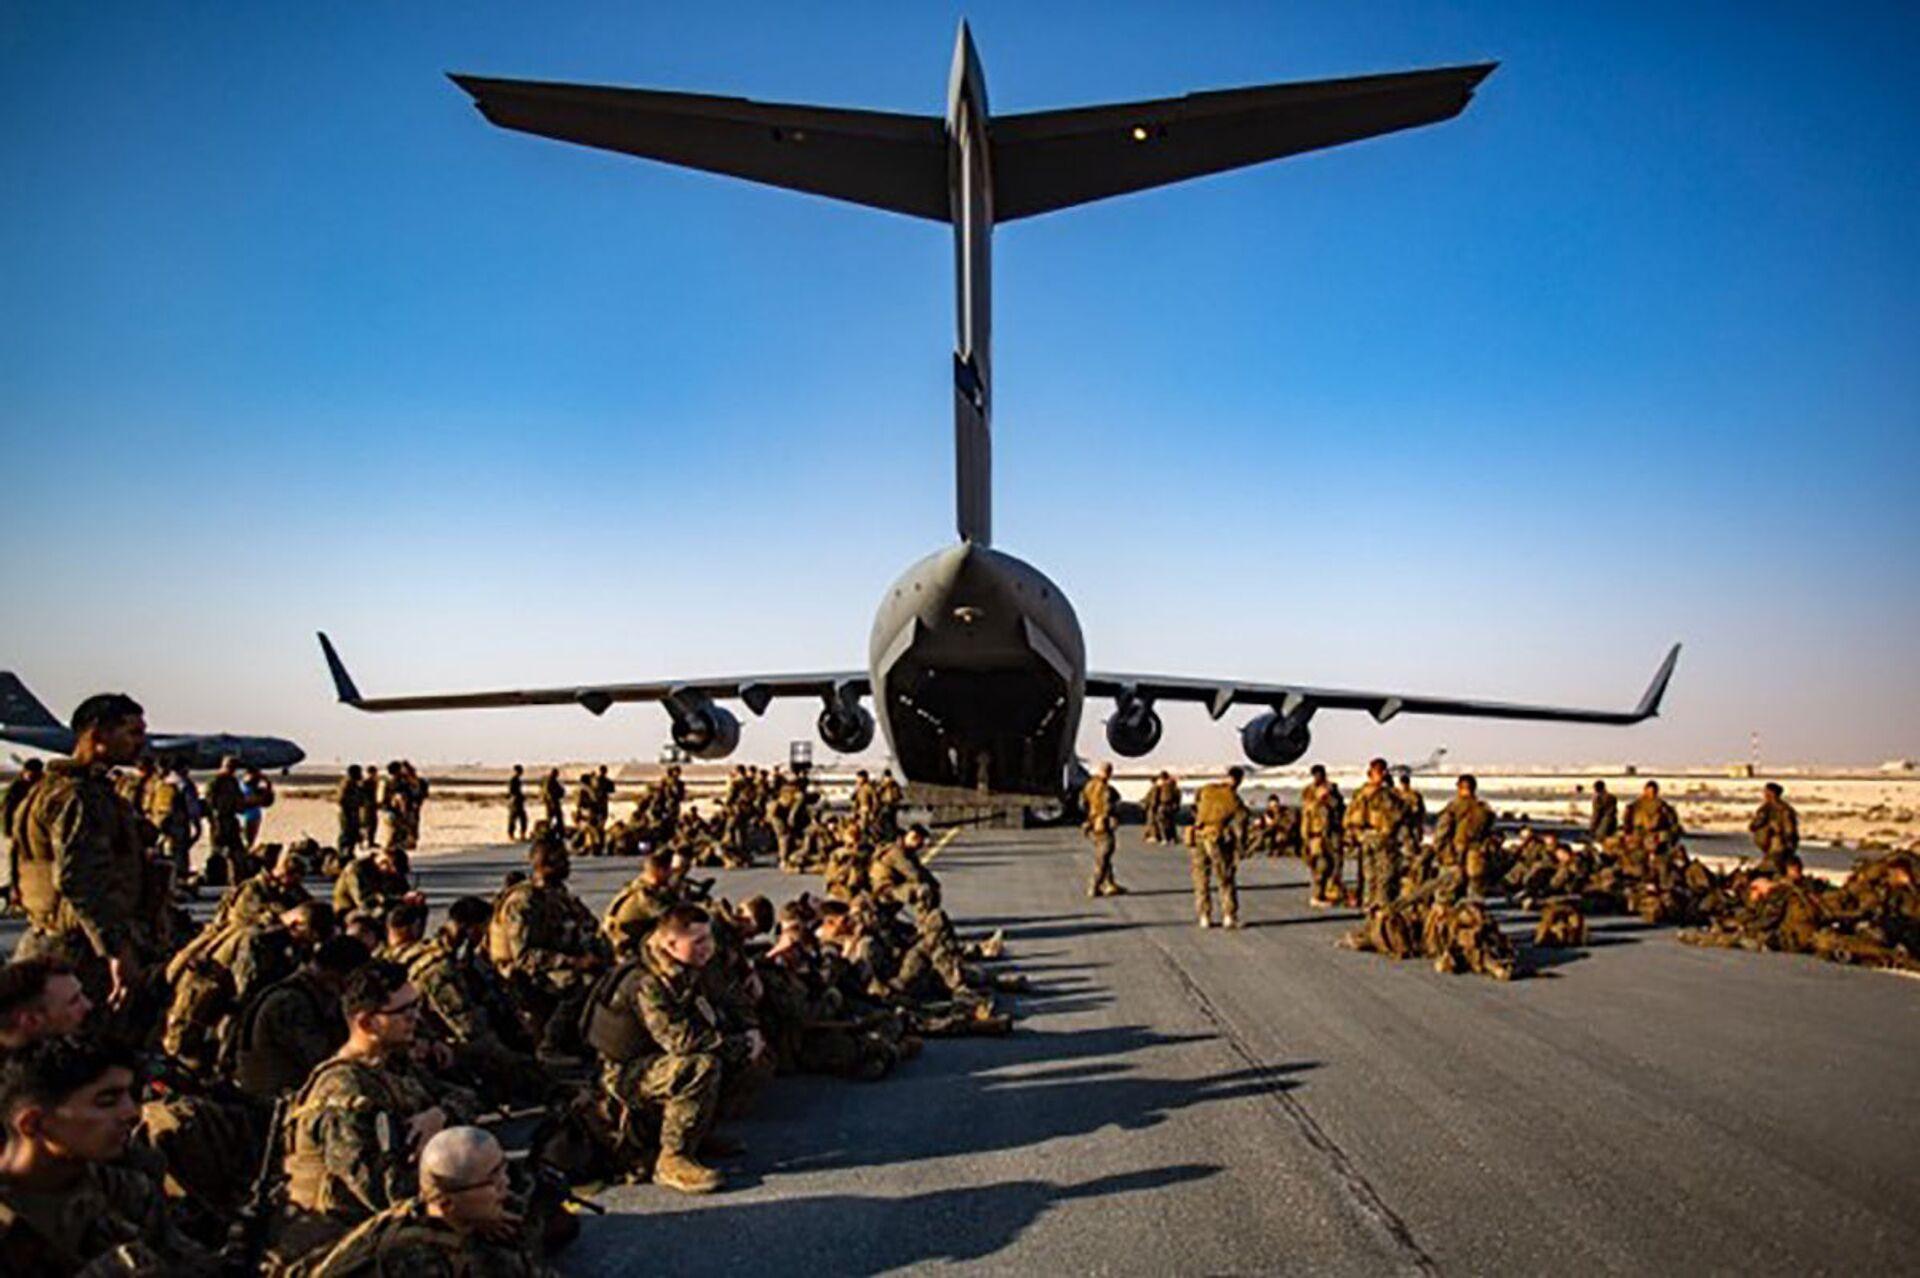 Marines assigned to the 24th Marine Expeditionary Unit (MEU) await a flight to Kabul Afghanistan, at Al Udeied Air Base, Qatar Tuesday, Aug. 17, 2021 - Sputnik International, 1920, 07.09.2021